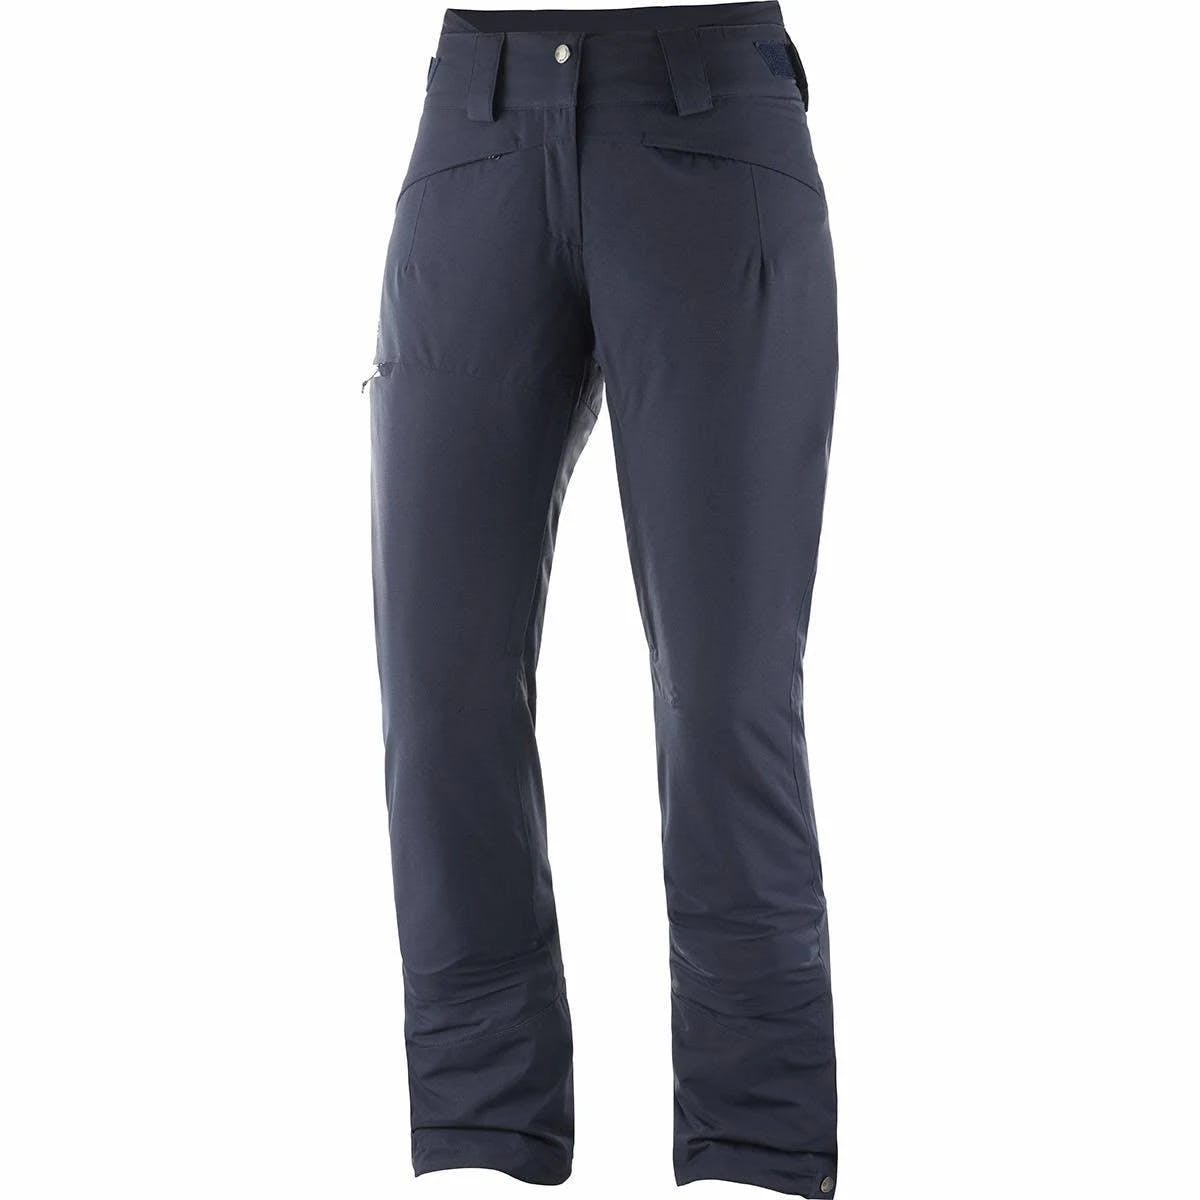 Salomon QST Women's Snow Pants